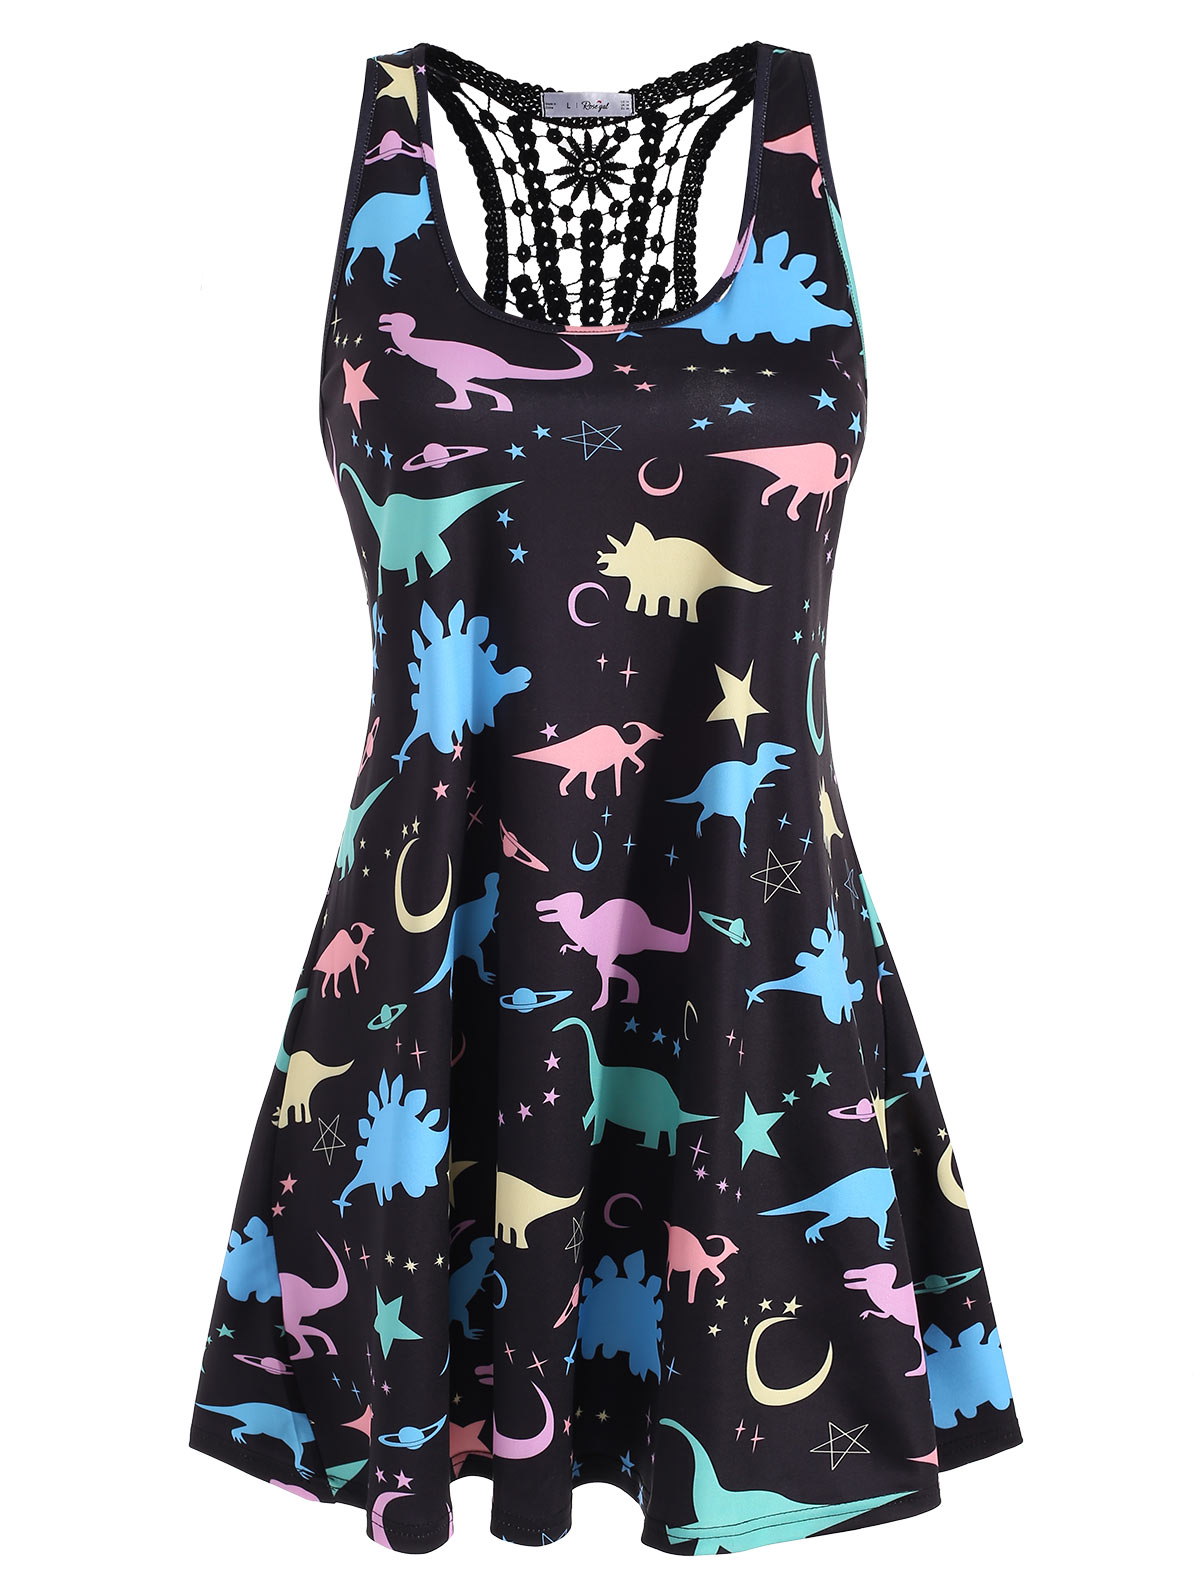 ROSE GAL Plus Size 5XL Summer Tank Tops Women Streetwear Dinosaur Animal Print Back Lace Sleeveless Top Tunic T Shirt Women in Tank Tops from Women 39 s Clothing